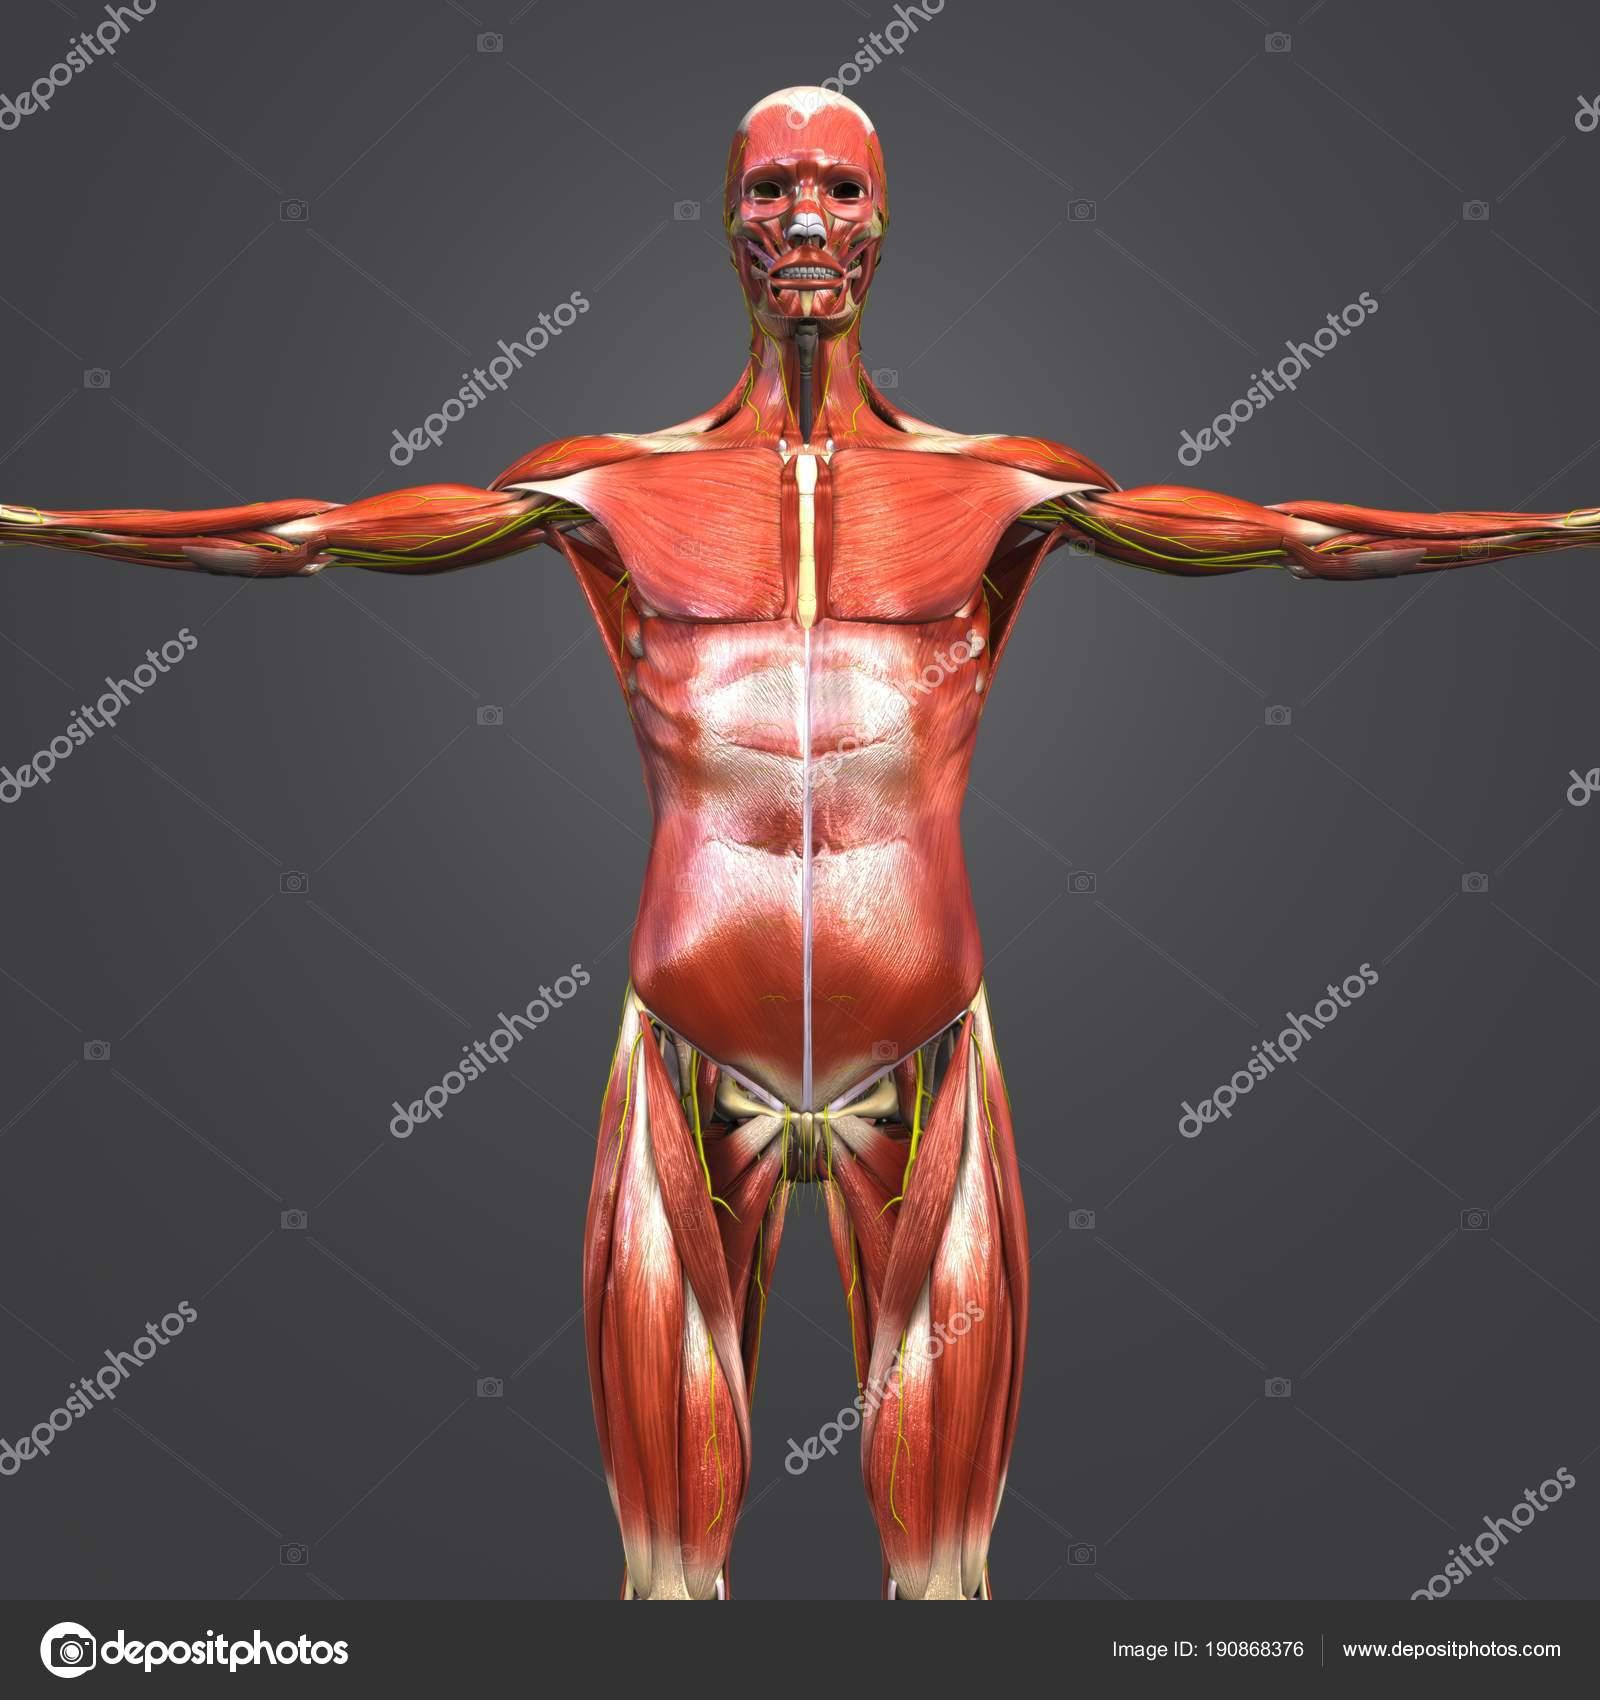 Colorida Ilustración Médica Anatomía Muscular Esquelética Humana Con ...